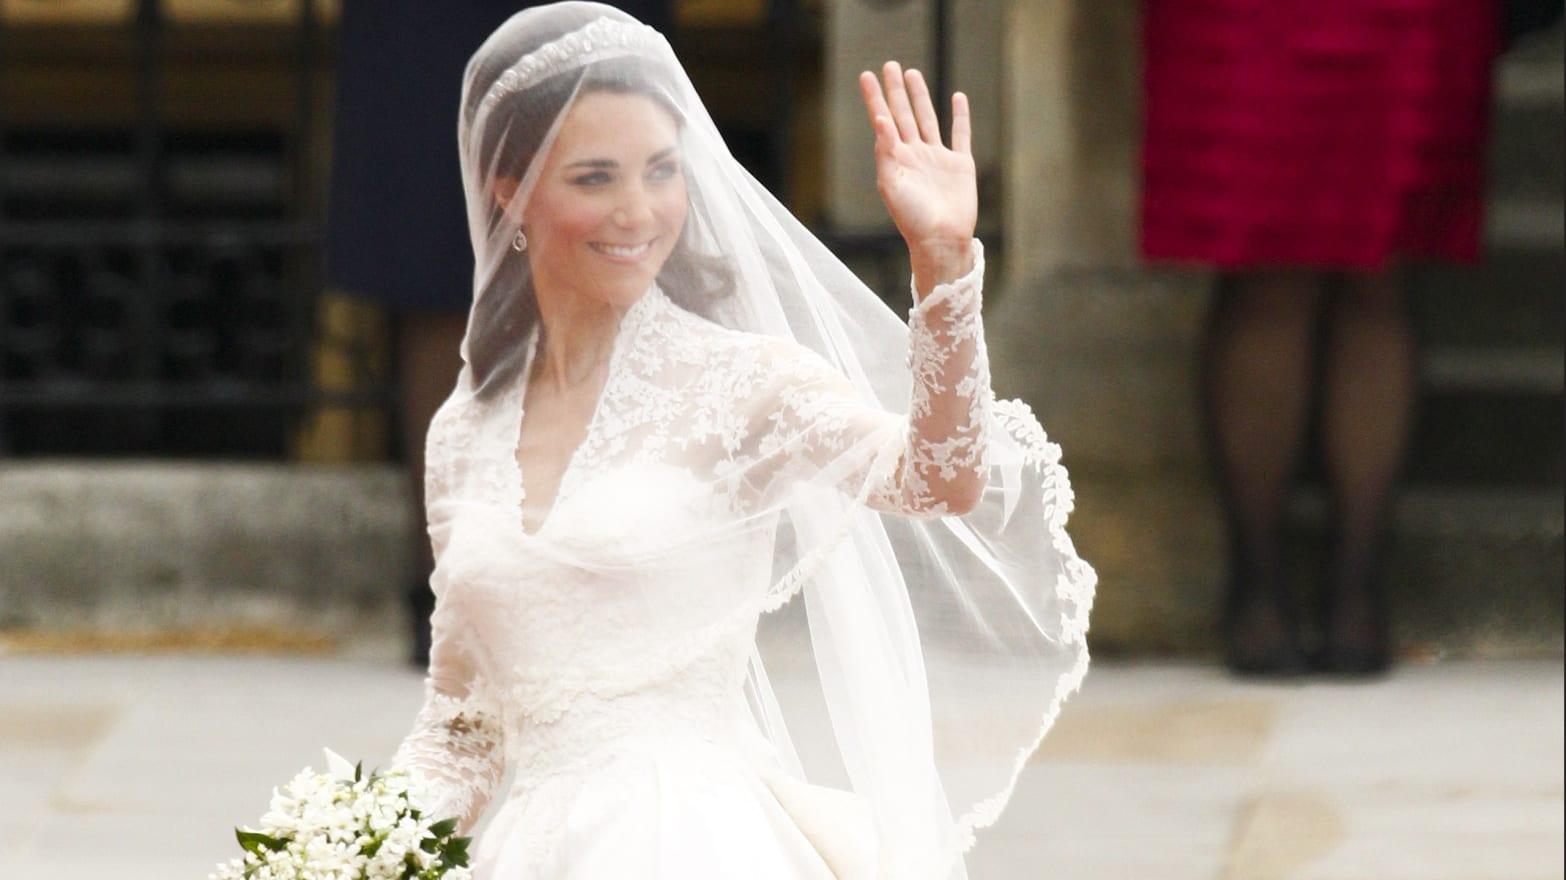 94892cb24084 Was Kate's Royal Wedding Dress a Rip-Off?